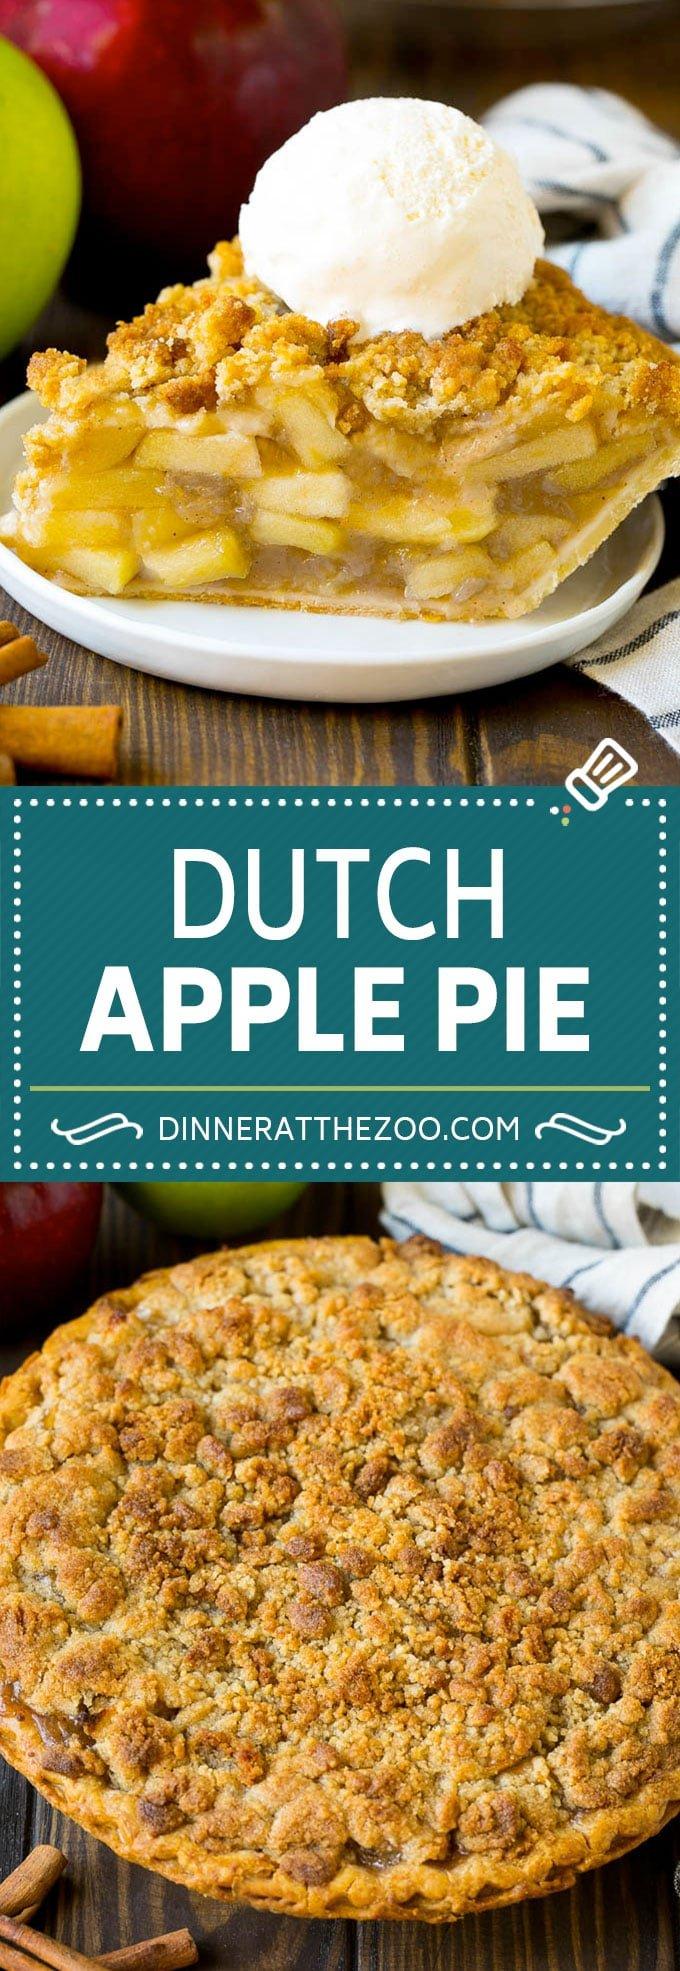 Dutch Apple Pie Recipe | Homemade Apple Pie #pie #apple #dessert #baking #fall #dinneratthezoo